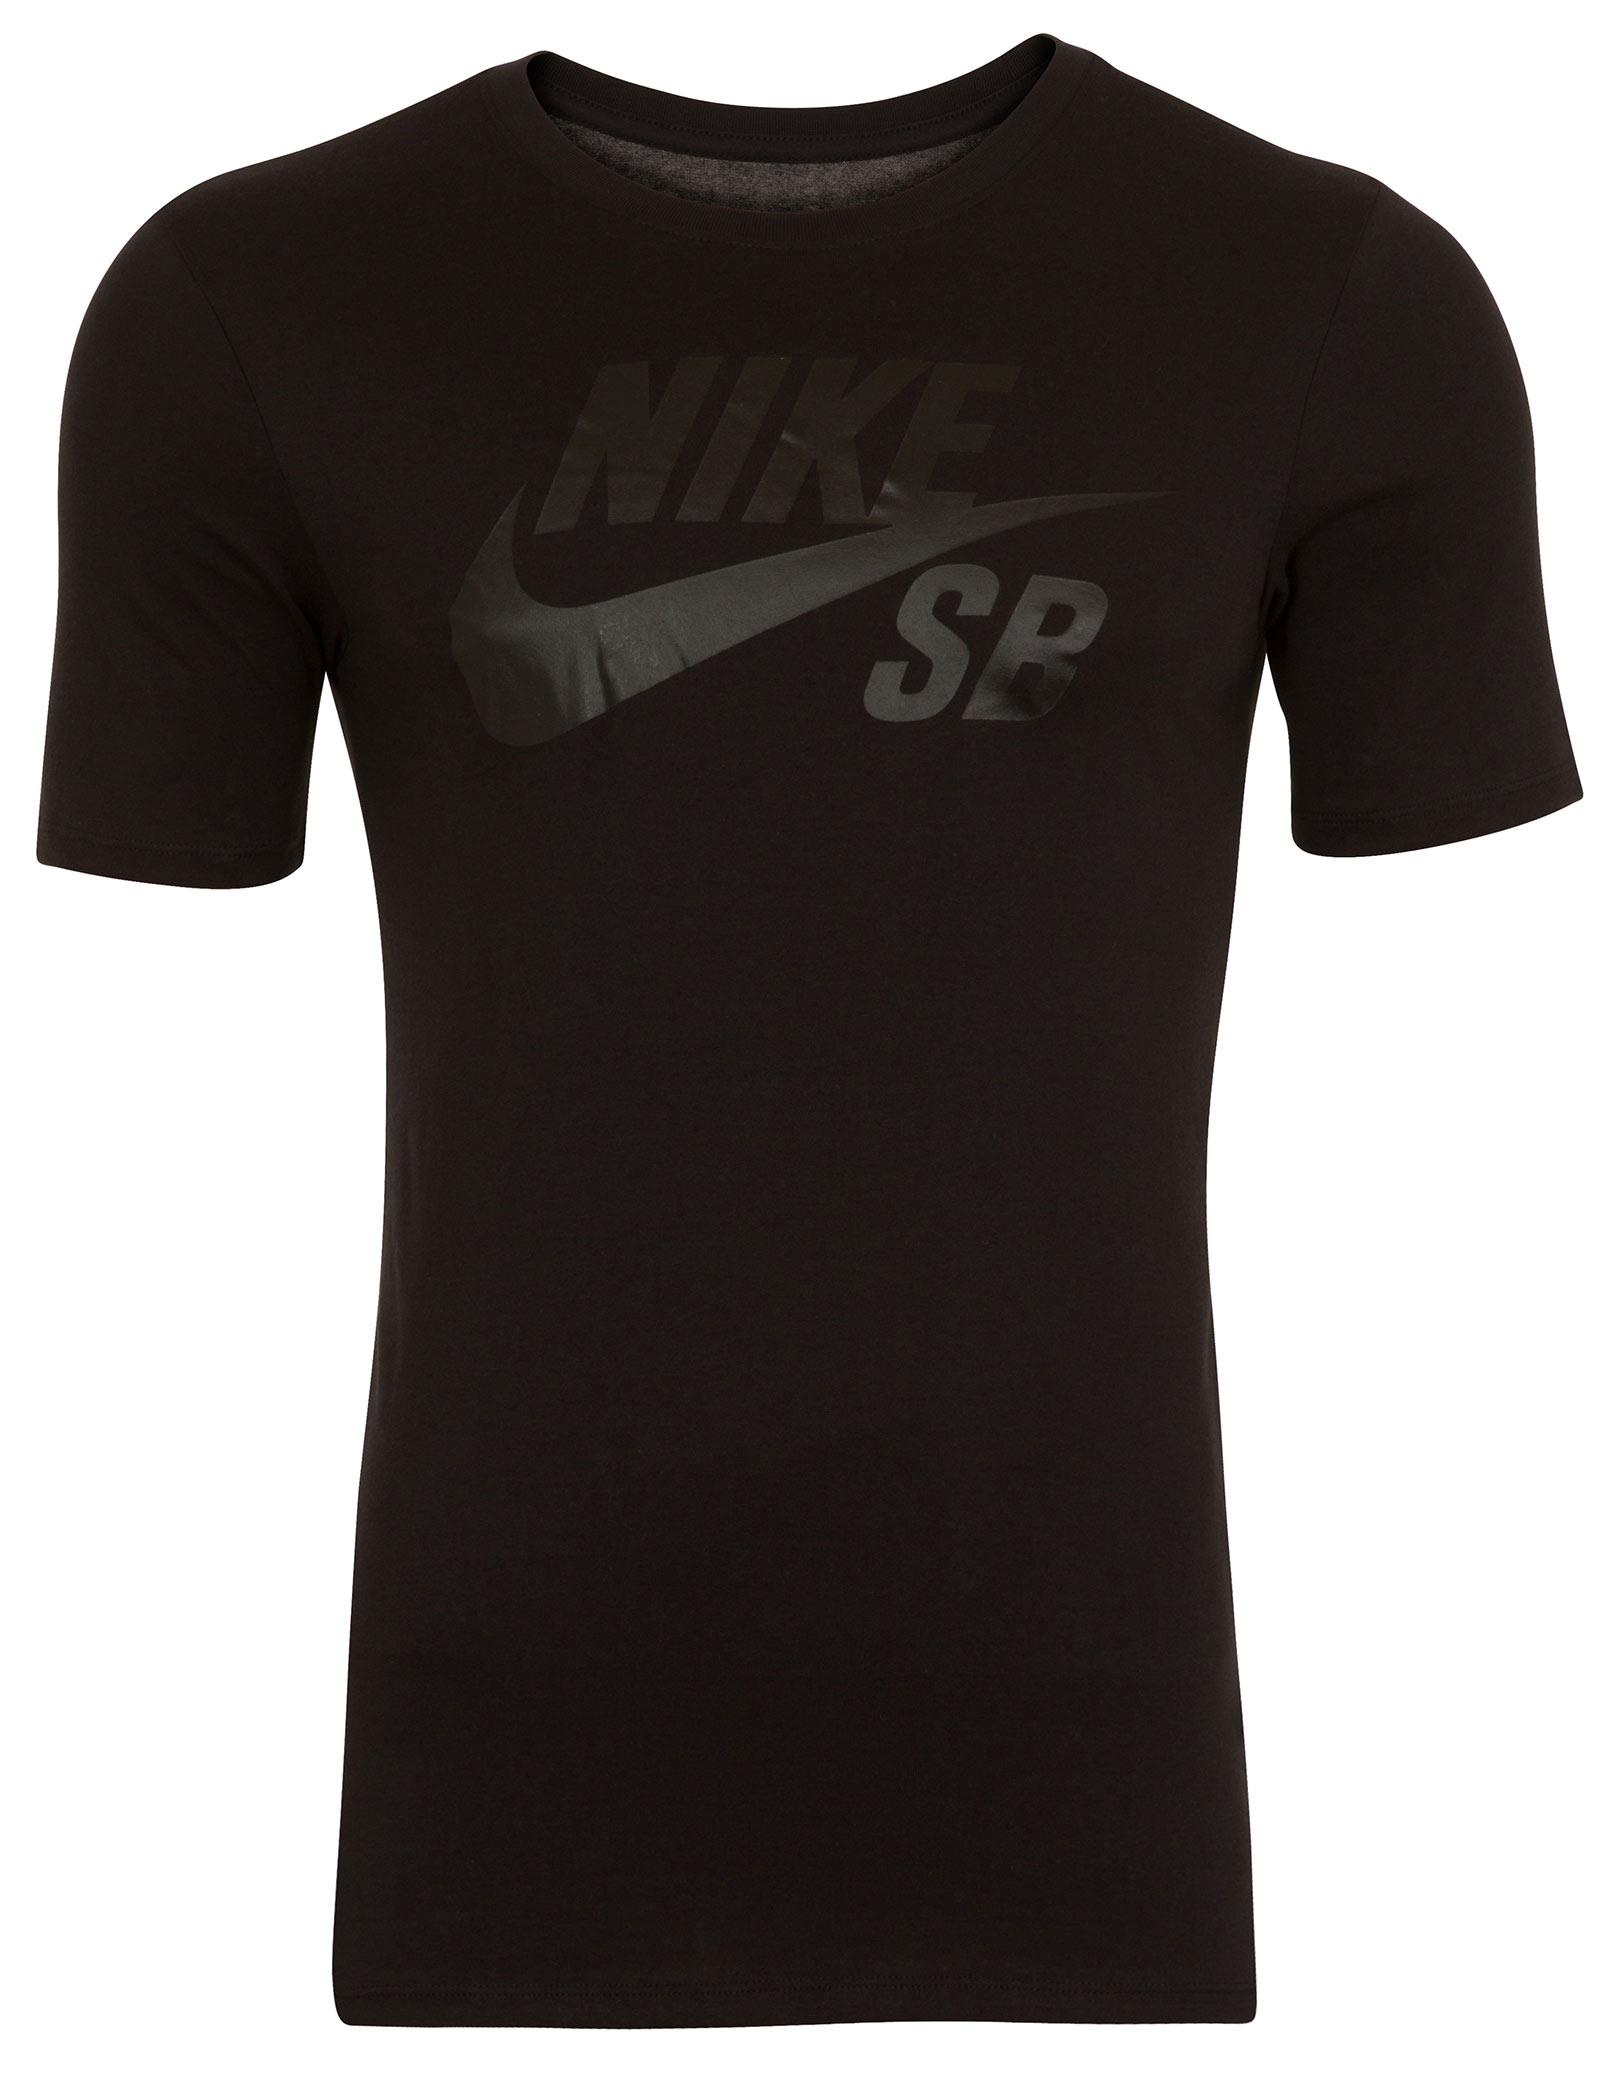 New nike sb skateboarding logo tee mens t shirt all sizes for Nike sb galaxy shirt